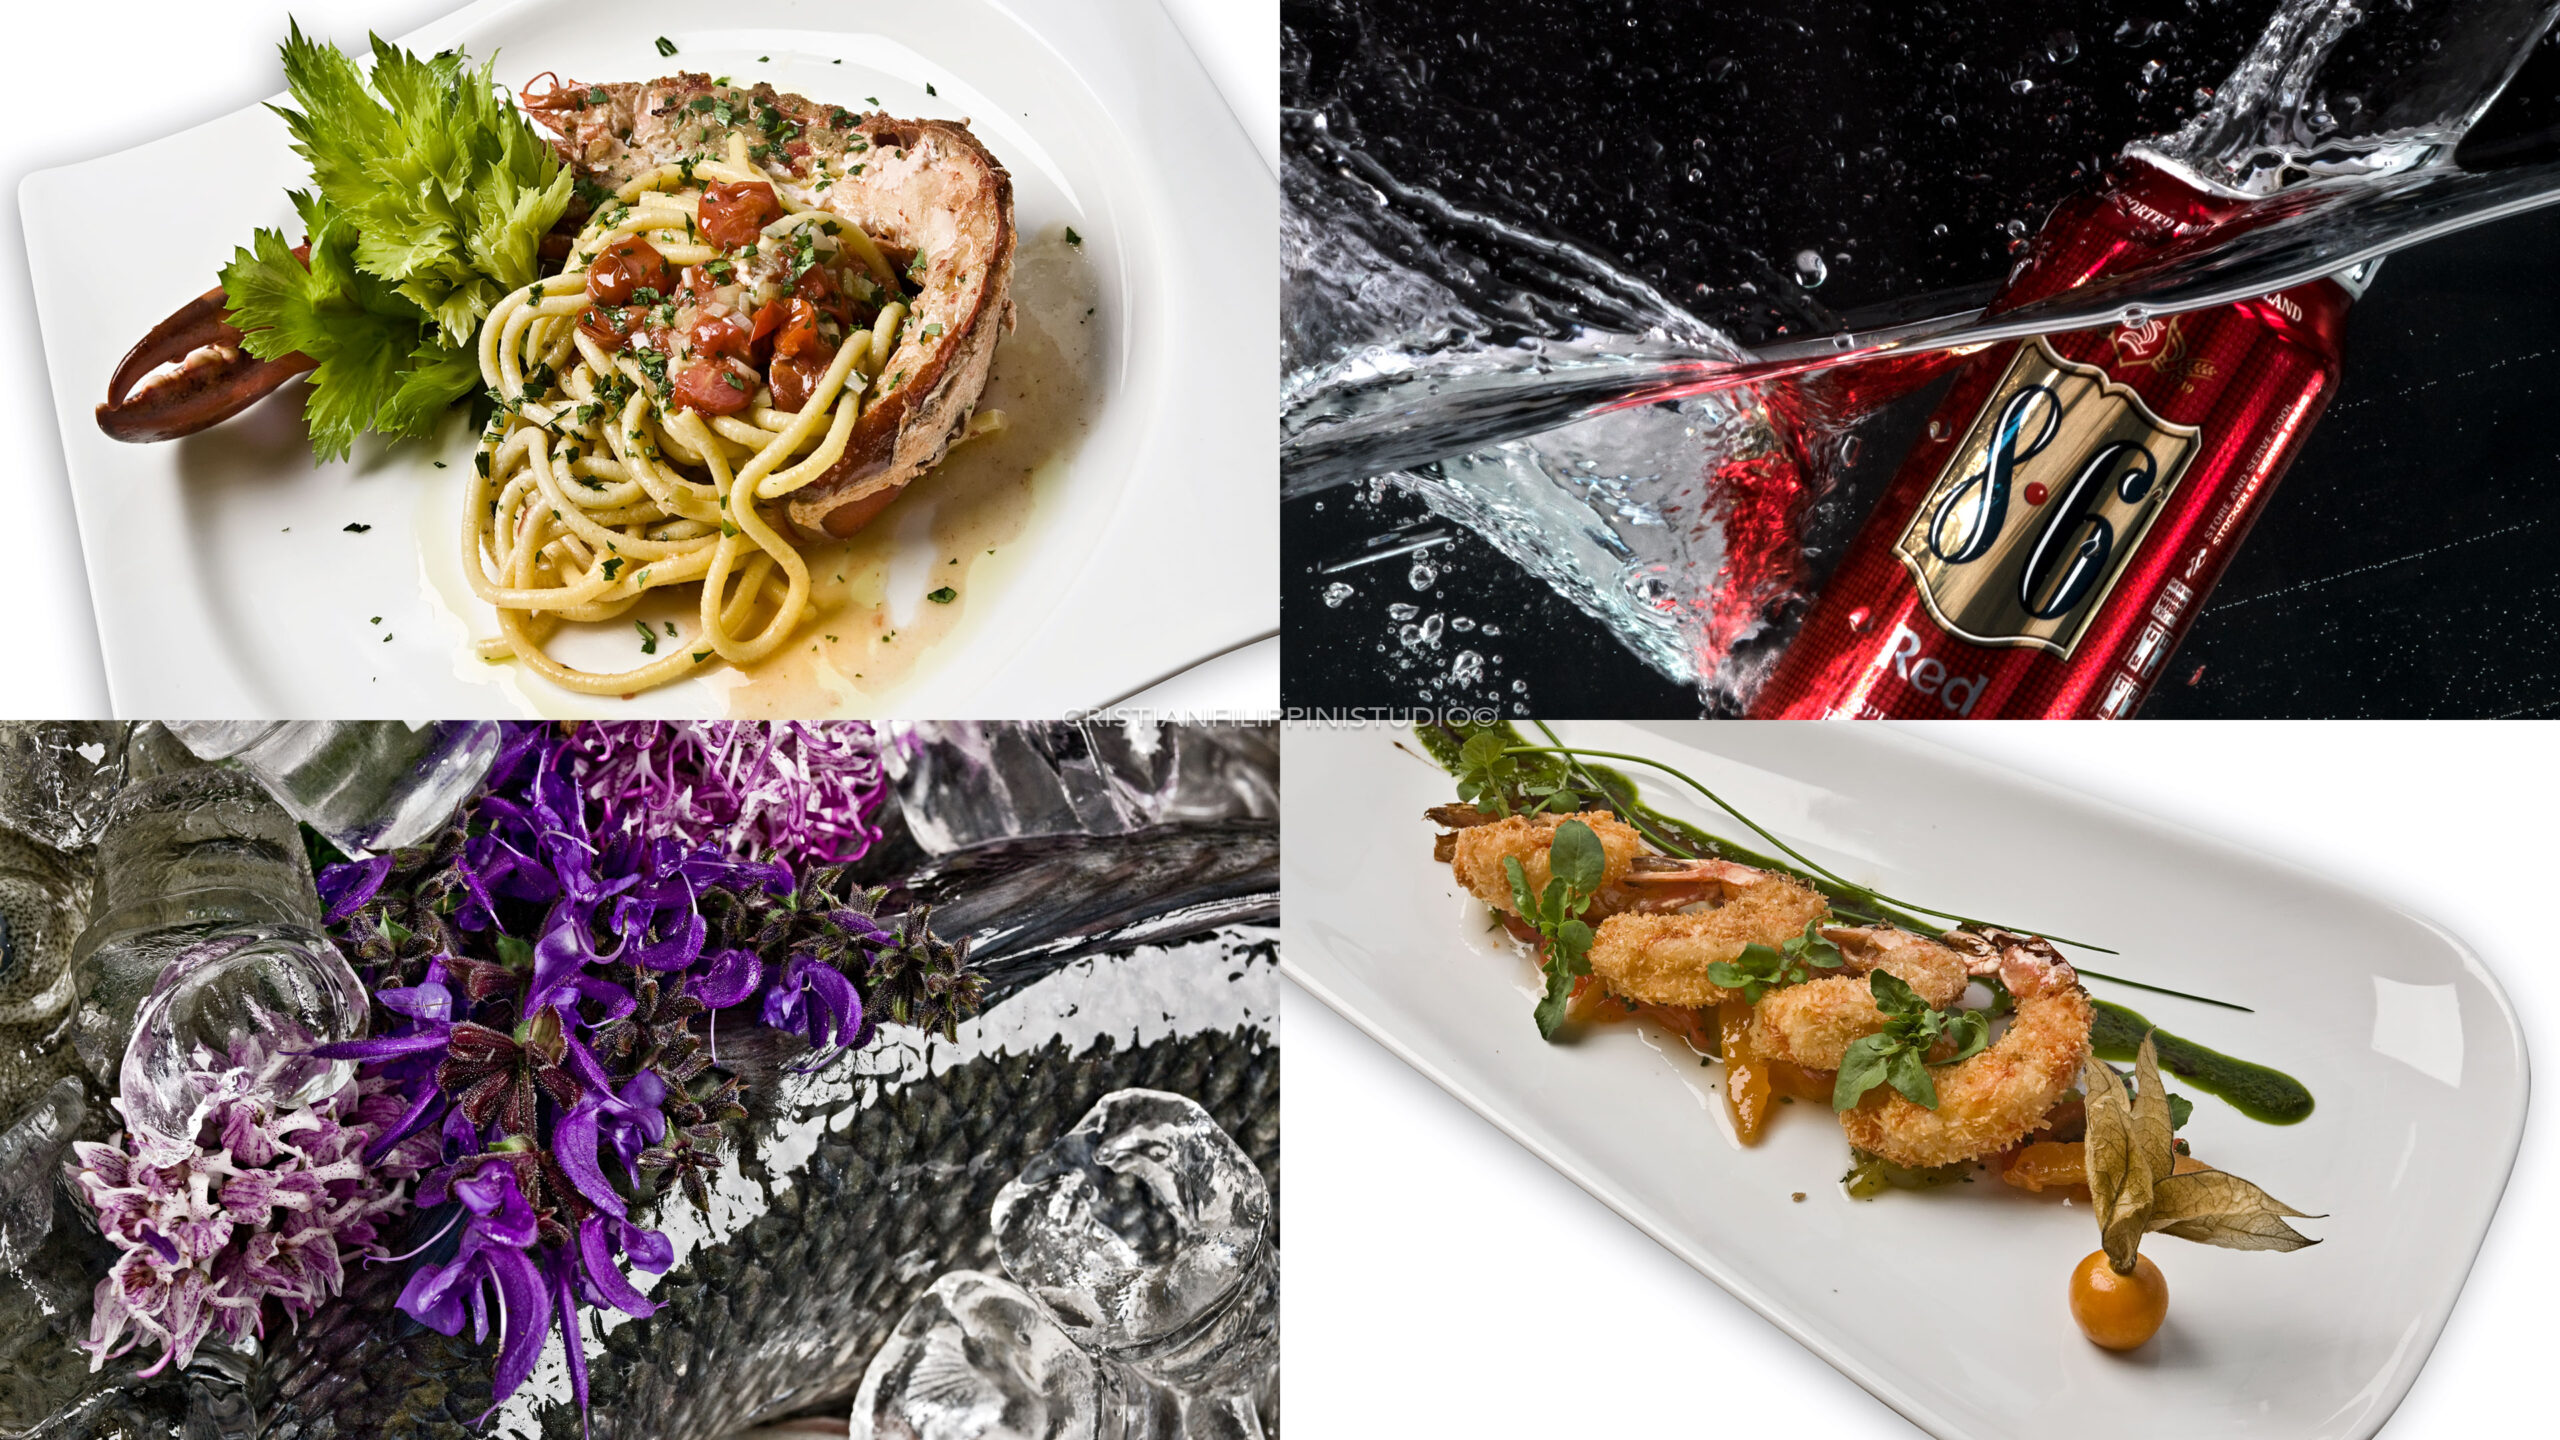 Food & Drink Photography | Cristian Filippini Studio © Fine Art Photography Video & Advertising